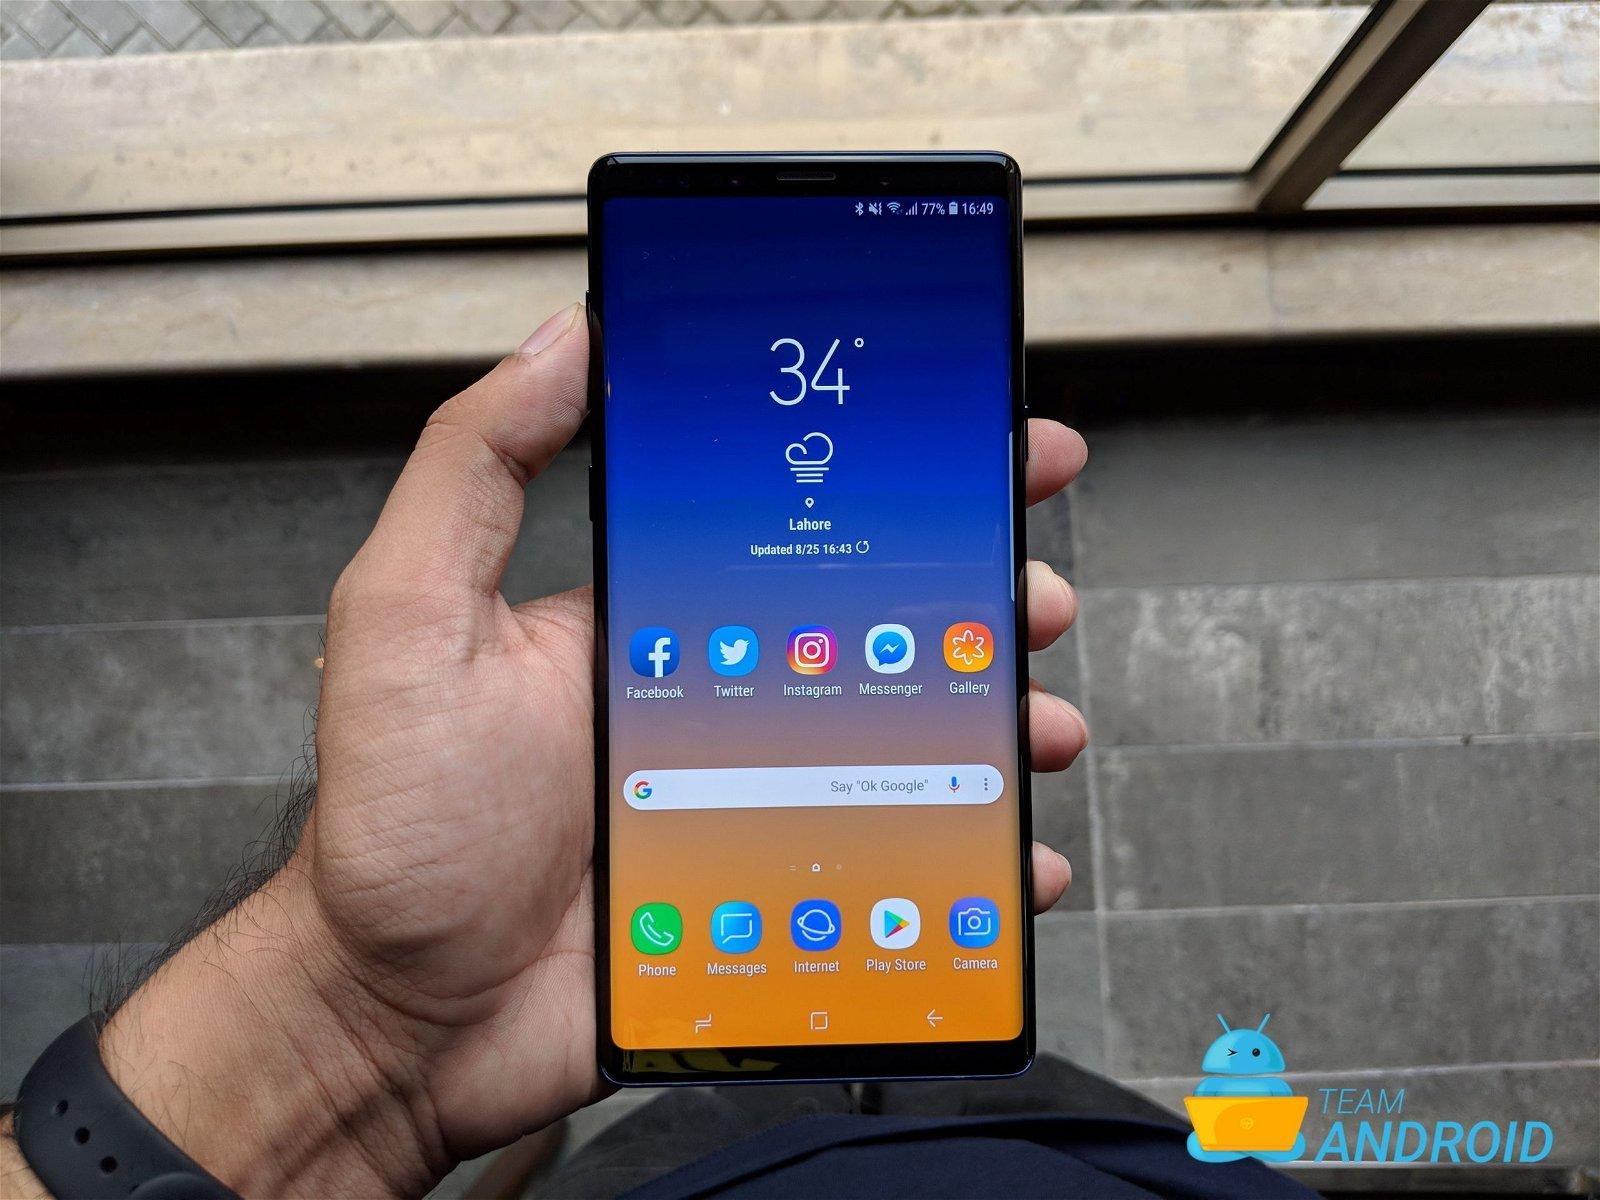 Top 7 Reasons to Buy Samsung Galaxy Note 9 6